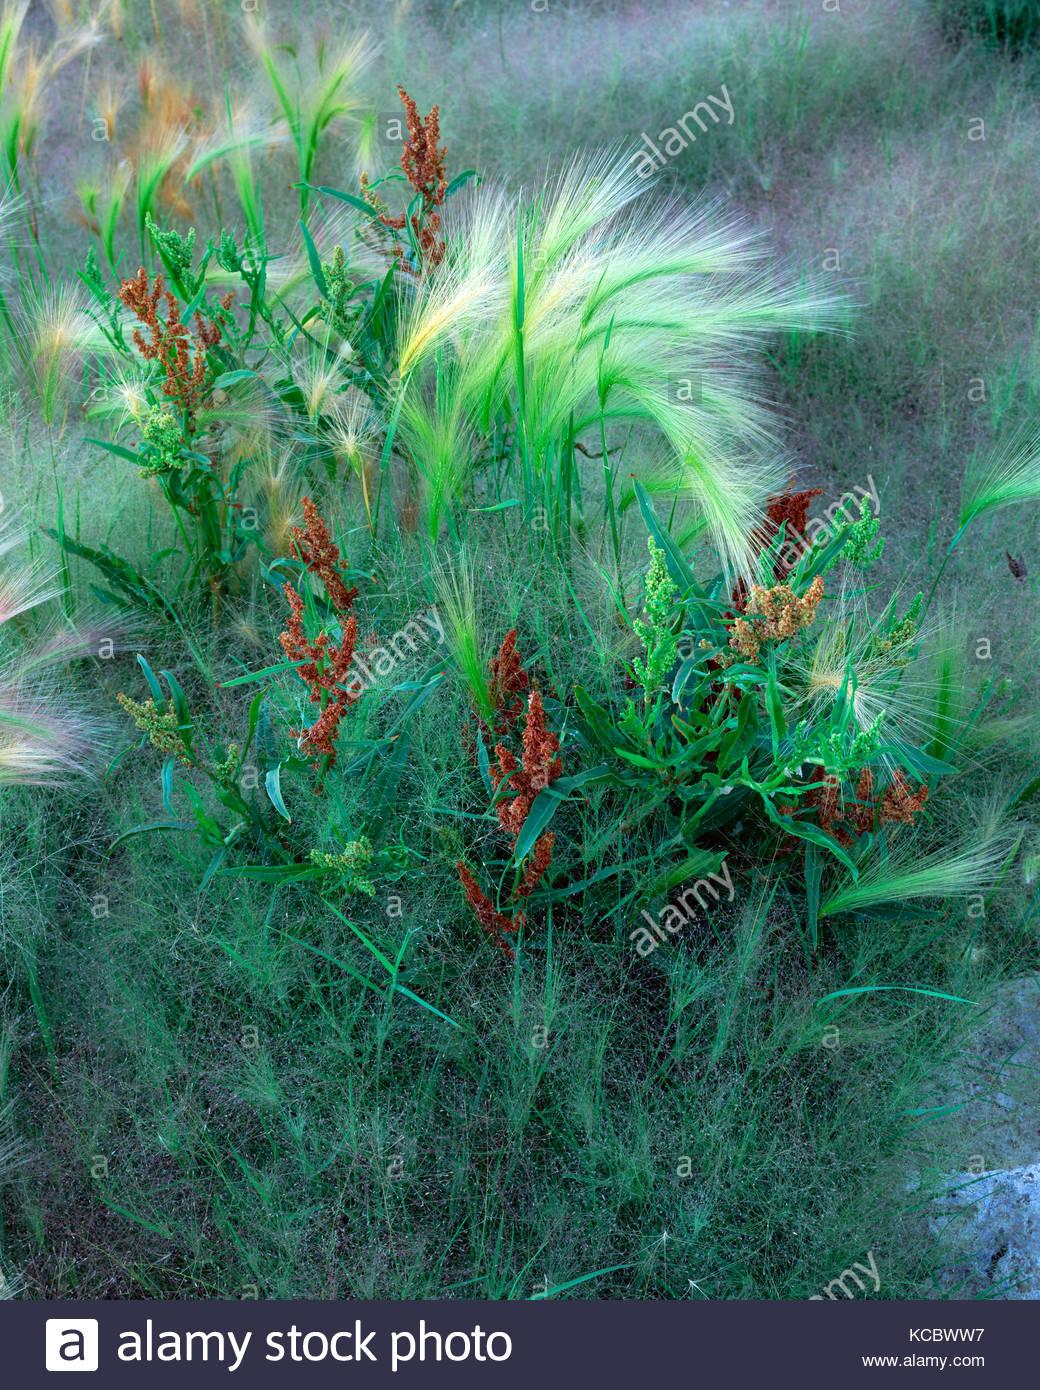 Mixed Grasses at Mono Lake, Mono Basin National Forest Scenic Area, California - Stock Image